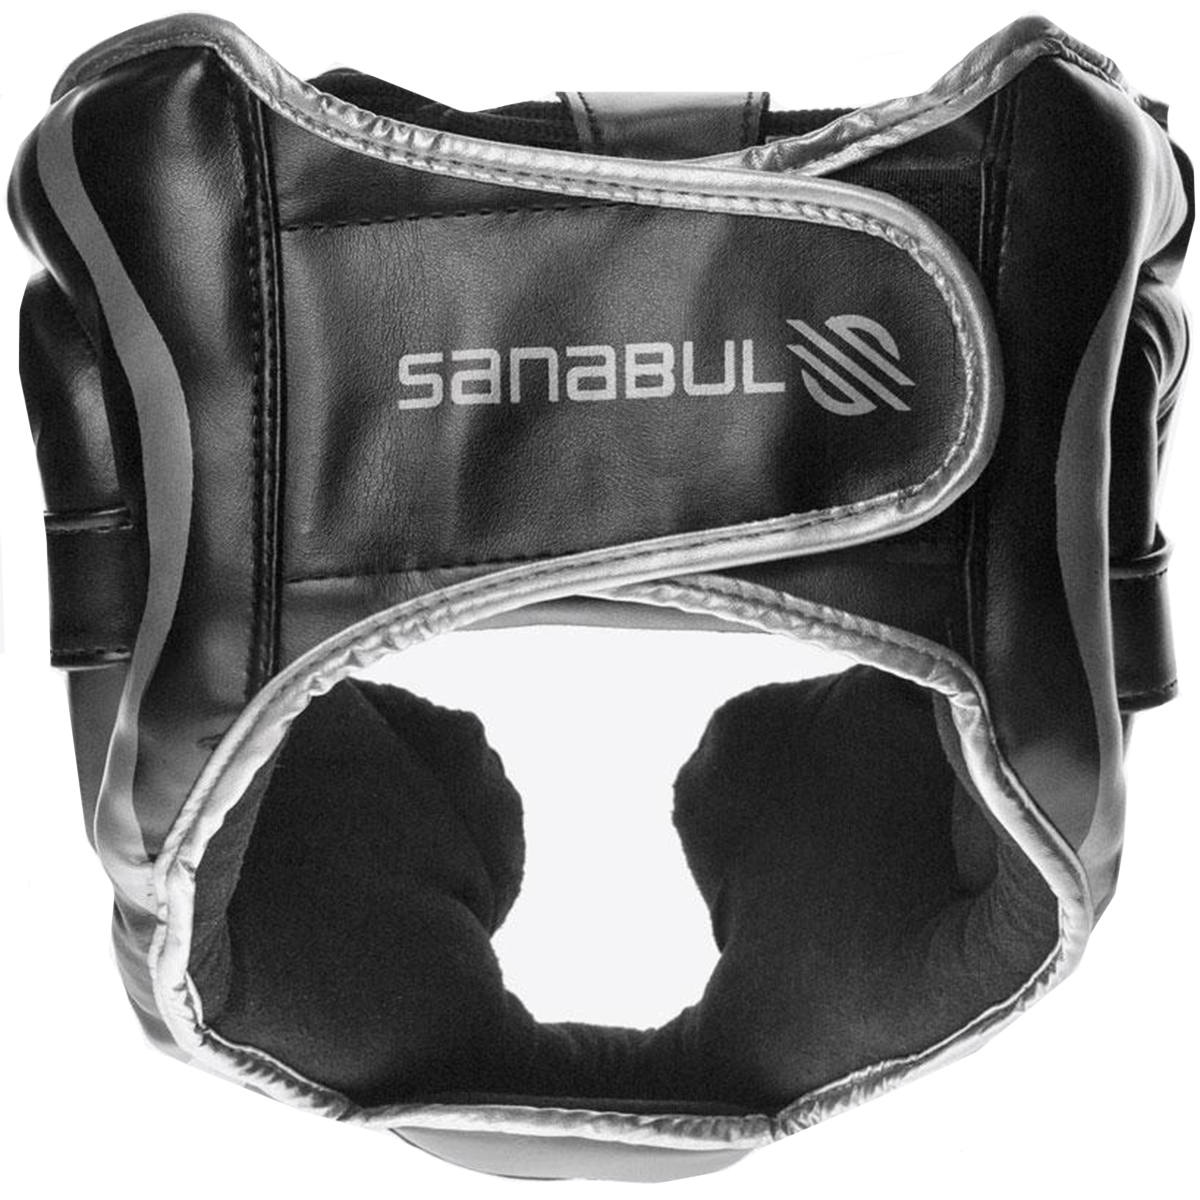 Sanabul Essential Series Professional Boxing and MMA Headgear